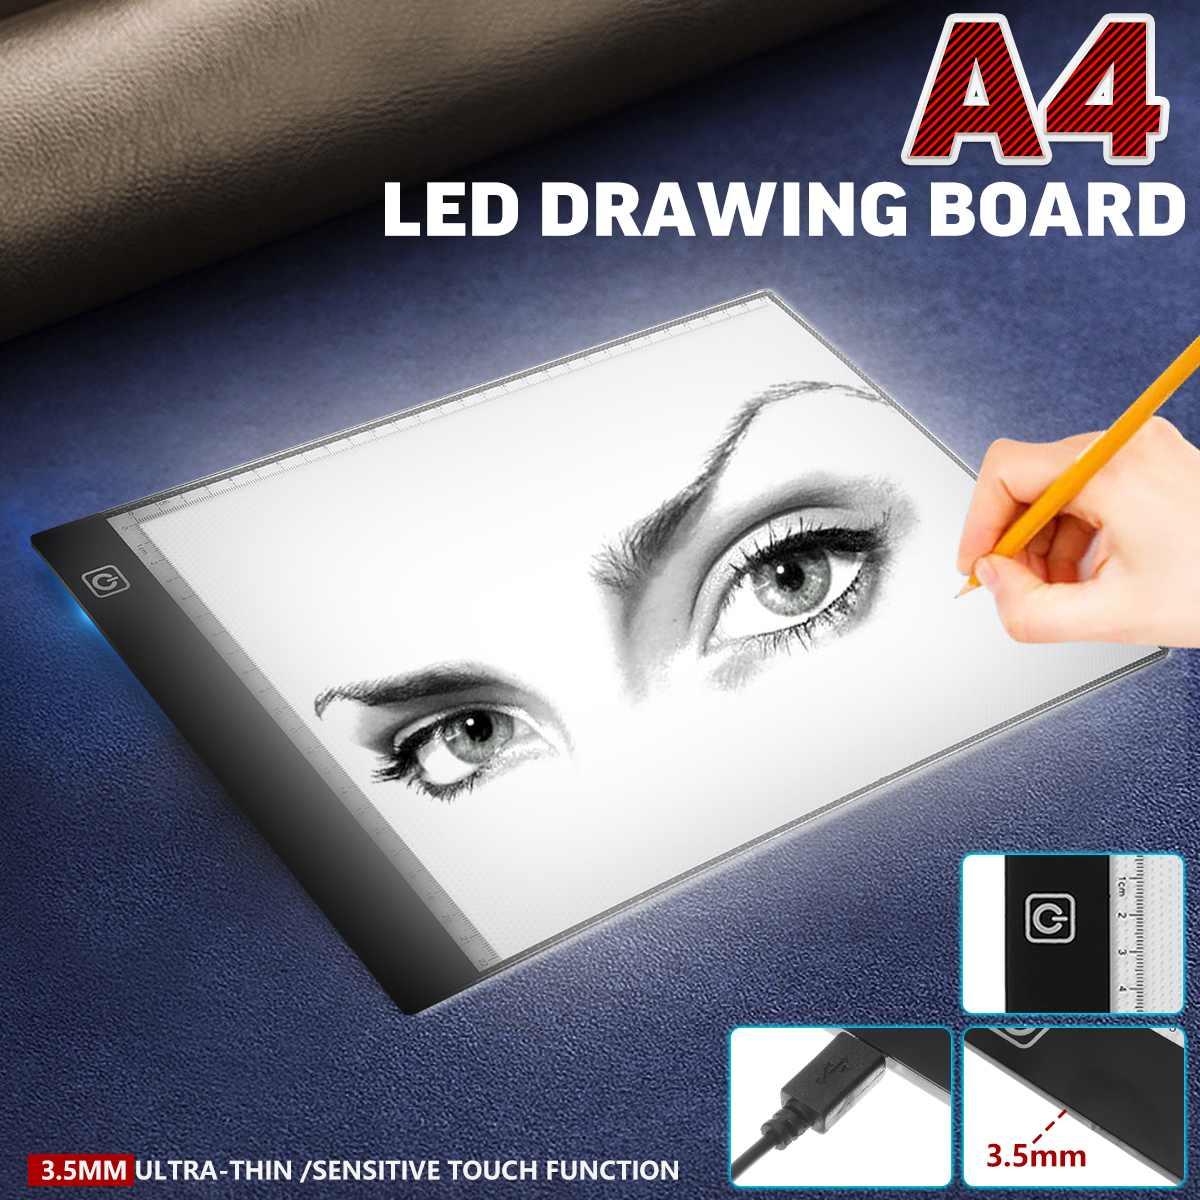 A4 led luz almofada led desenho placa cópia almofada artista caixa de luz mesa traçando desenho placa almofada pintura diamante bordado ferramentas